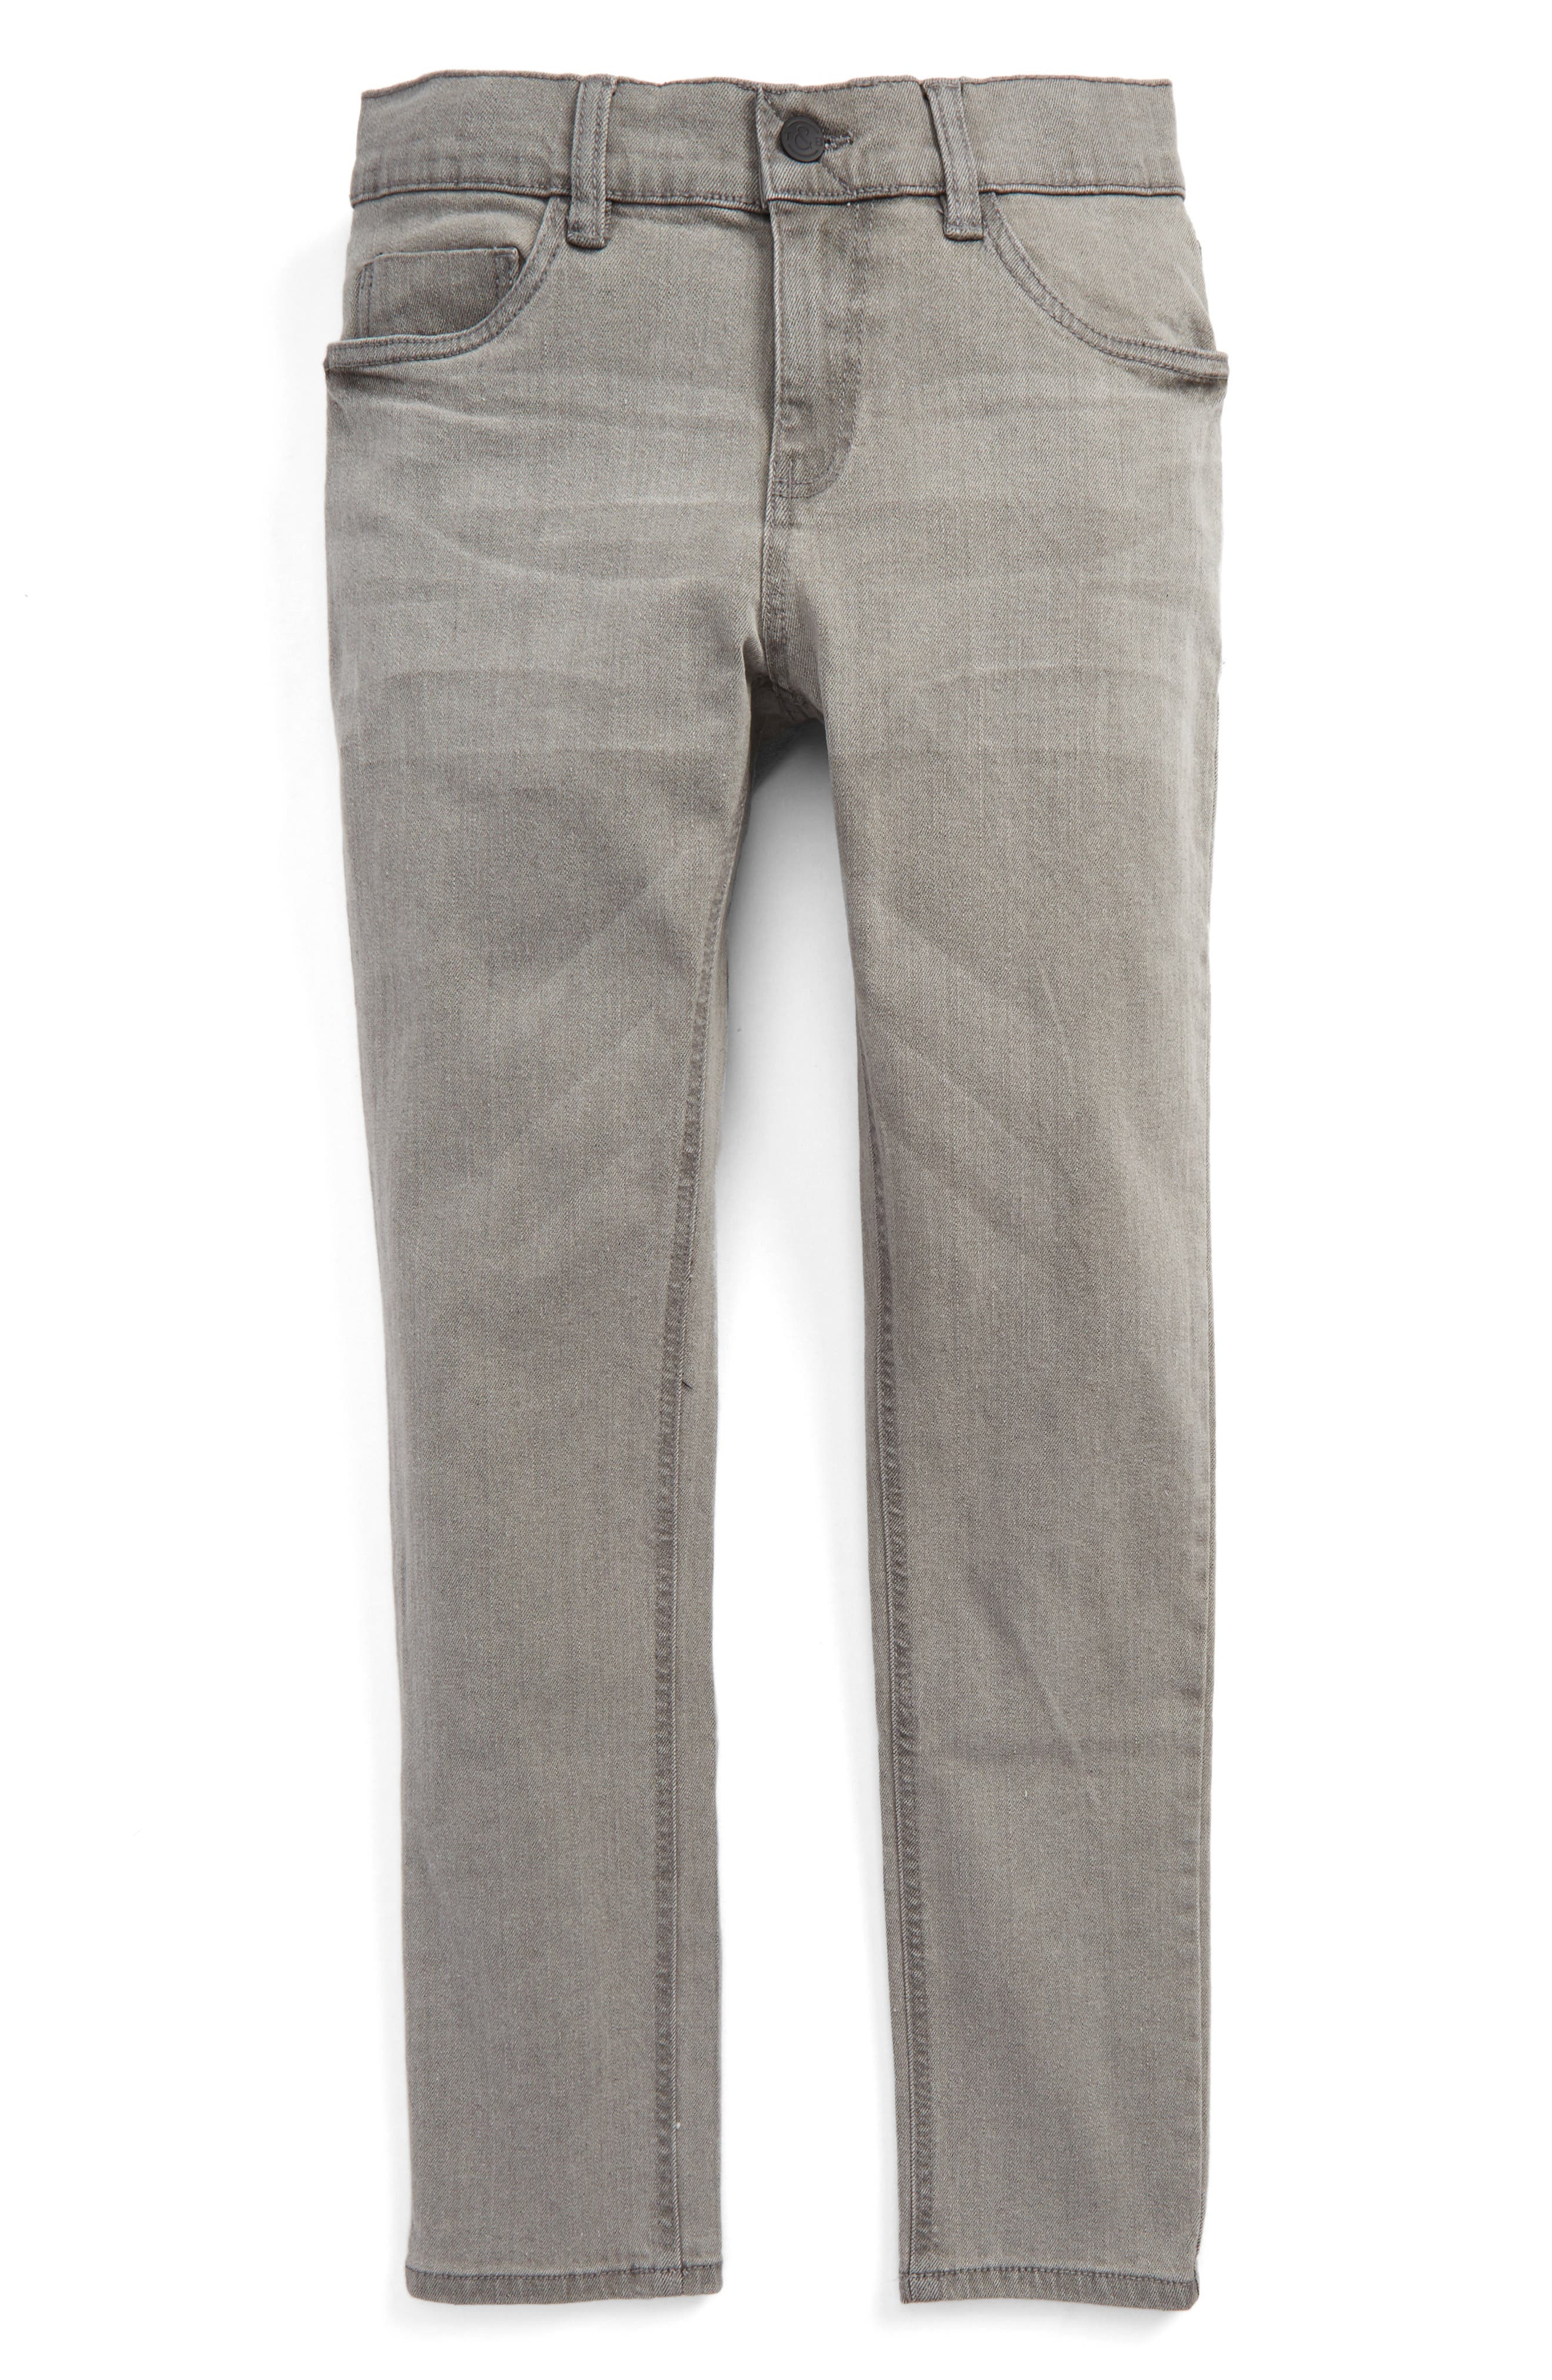 Alternate Image 1 Selected - Treasure & Bond Slouch Skinny Jeans (Big Boys)